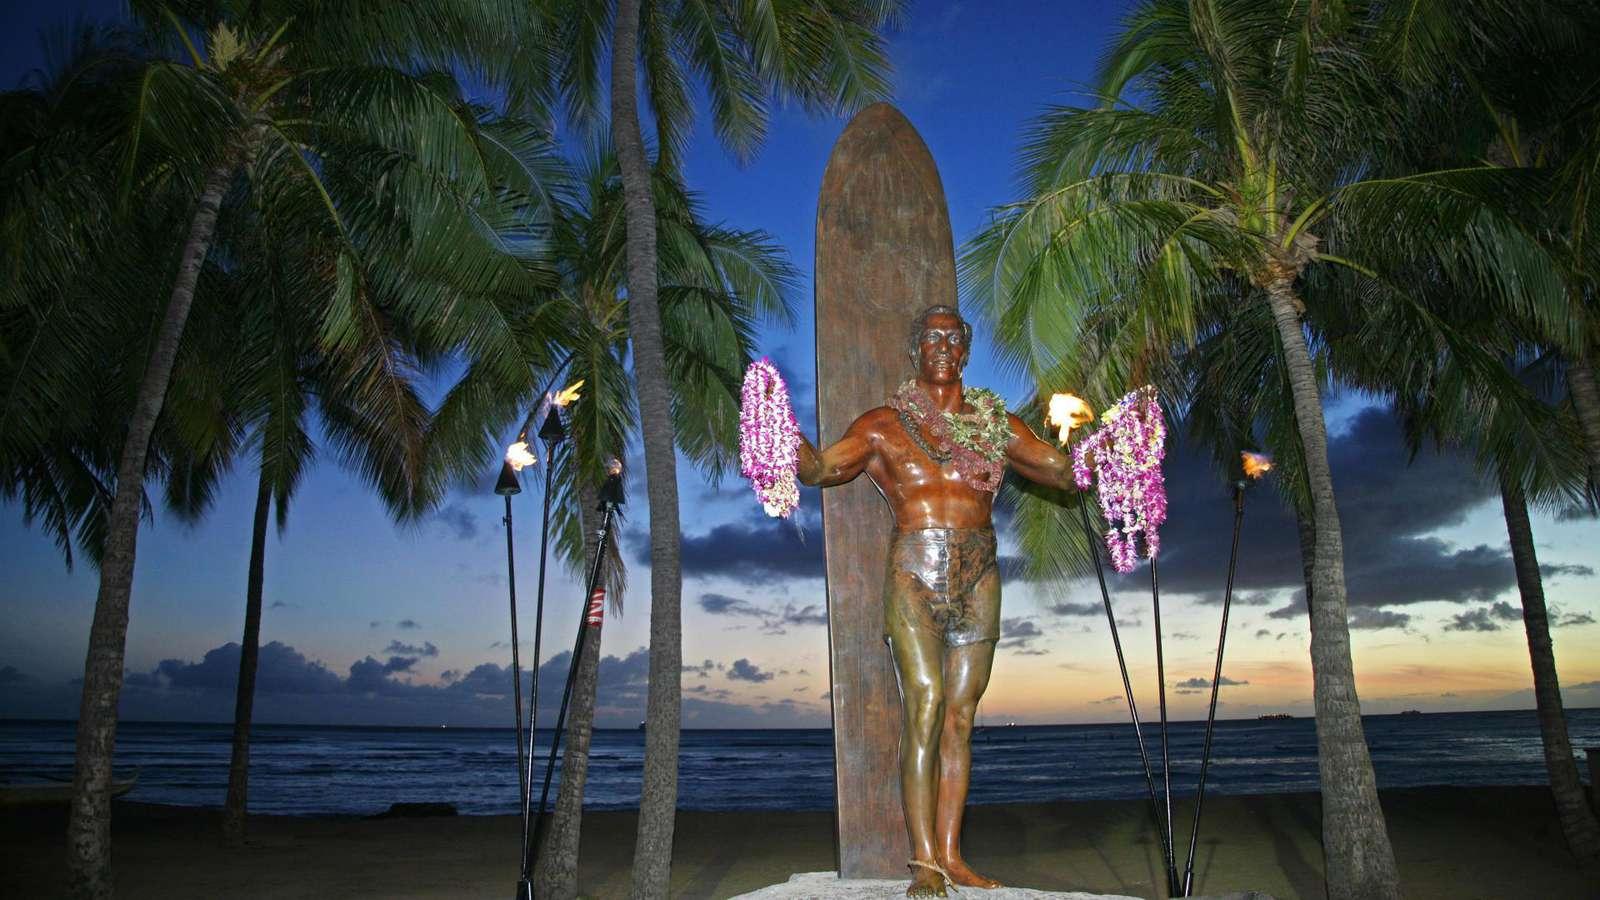 Famous Duke Kahanamoku Statue - just a block away!